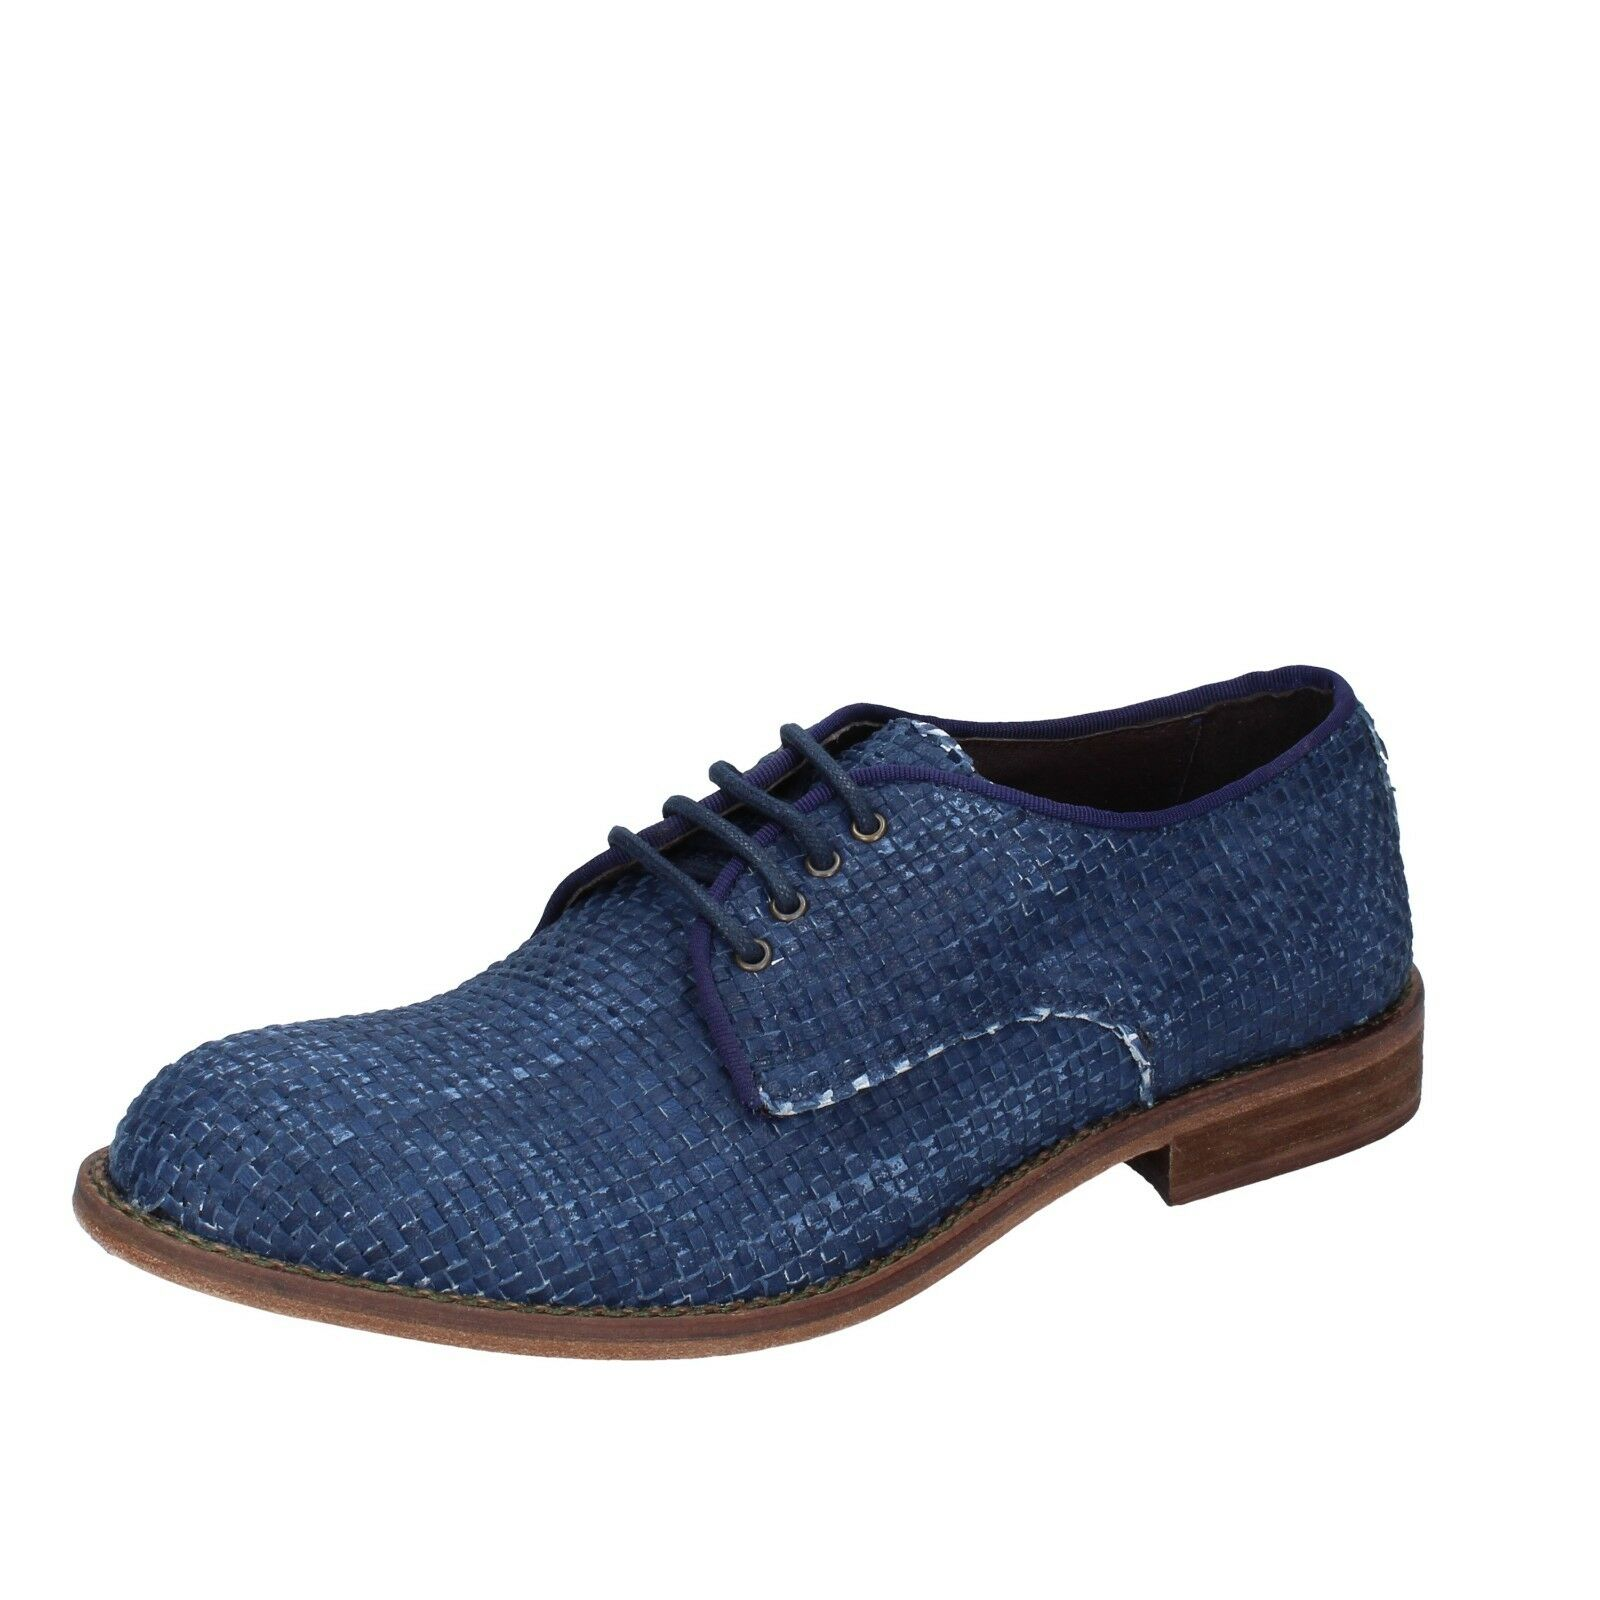 Mens shoes EVC 6 () elegant bluee leather BT959-40